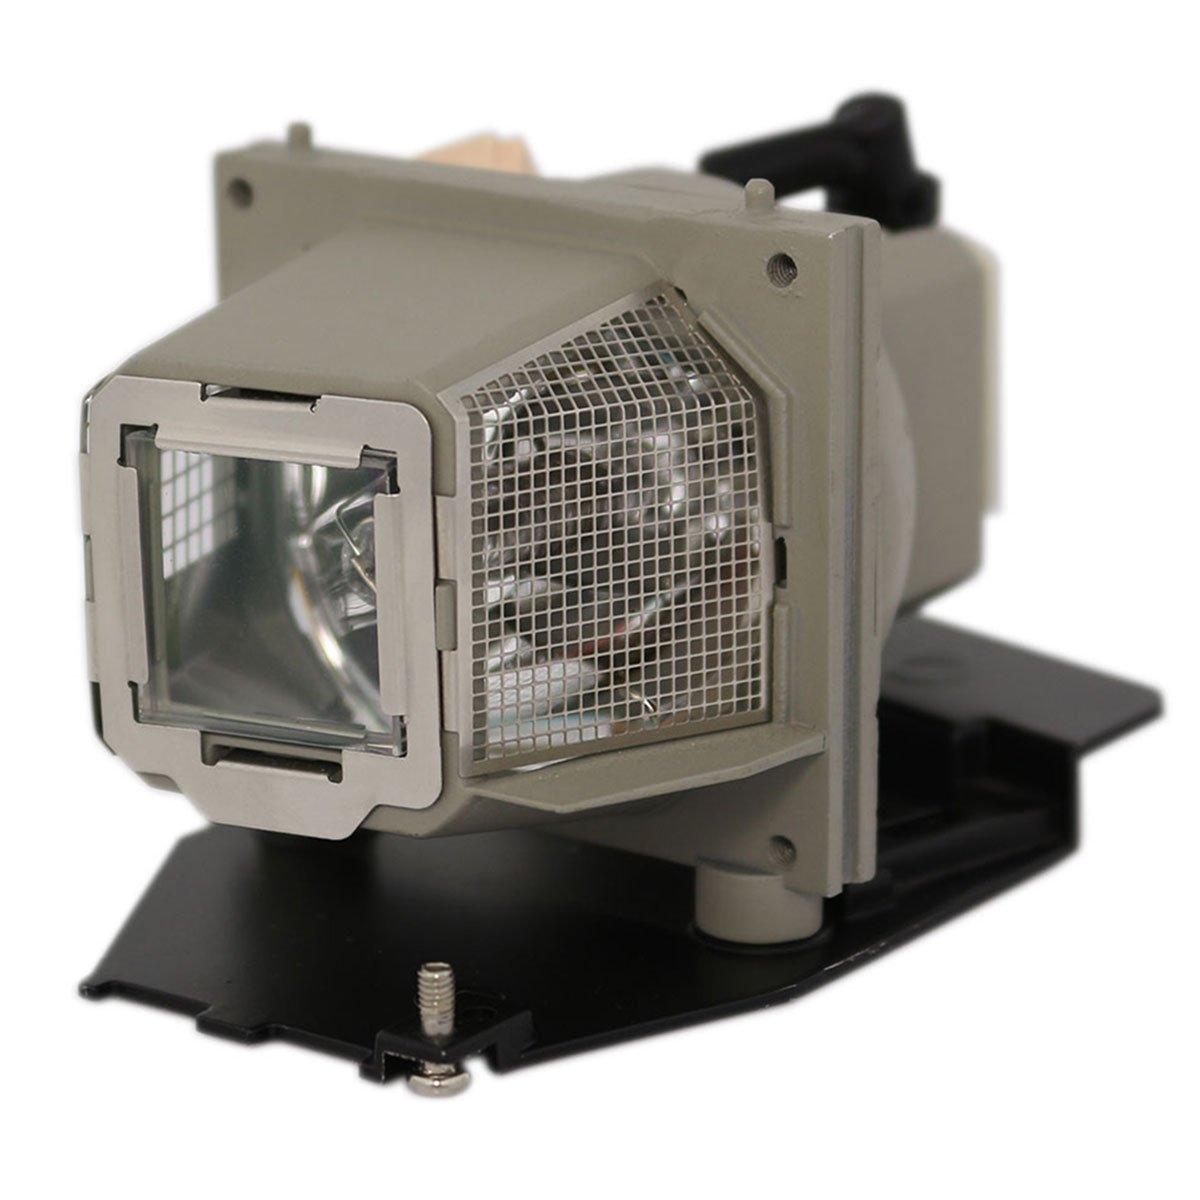 AuraBeam エコノミー交換用プロジェクターランプ HP L2152A ハウジング付き   B0141Z5U6I